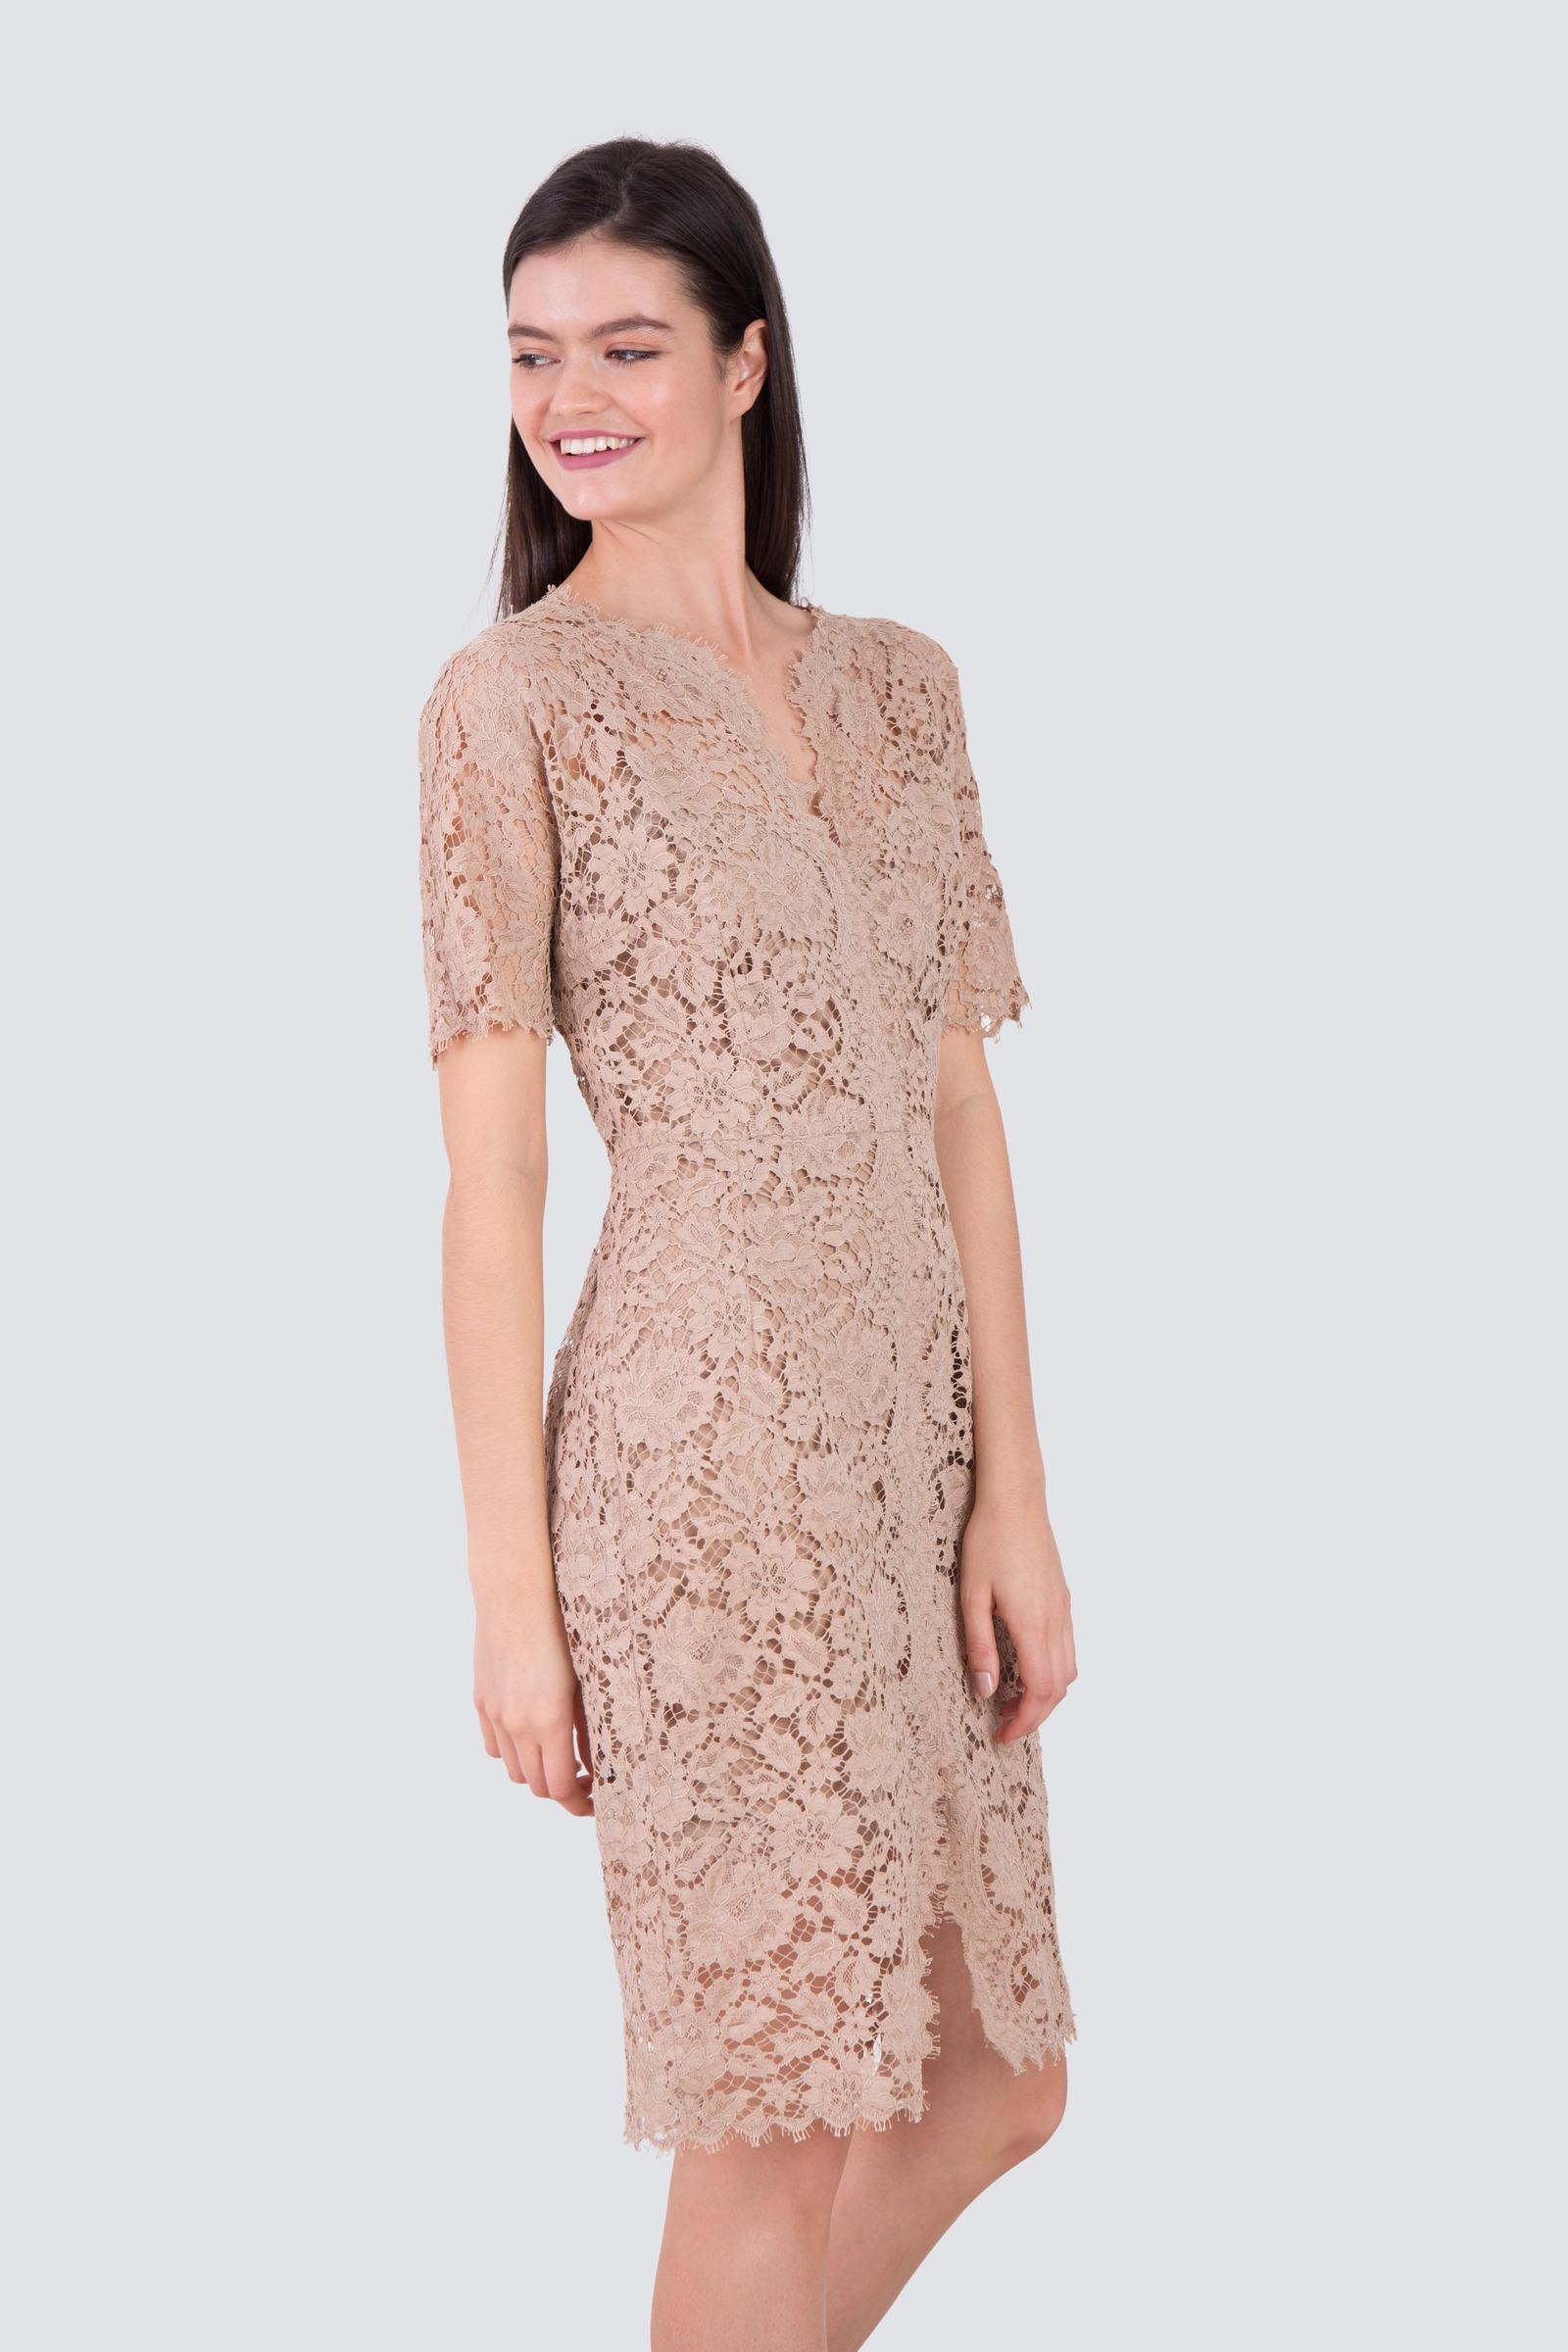 designer lace dresses